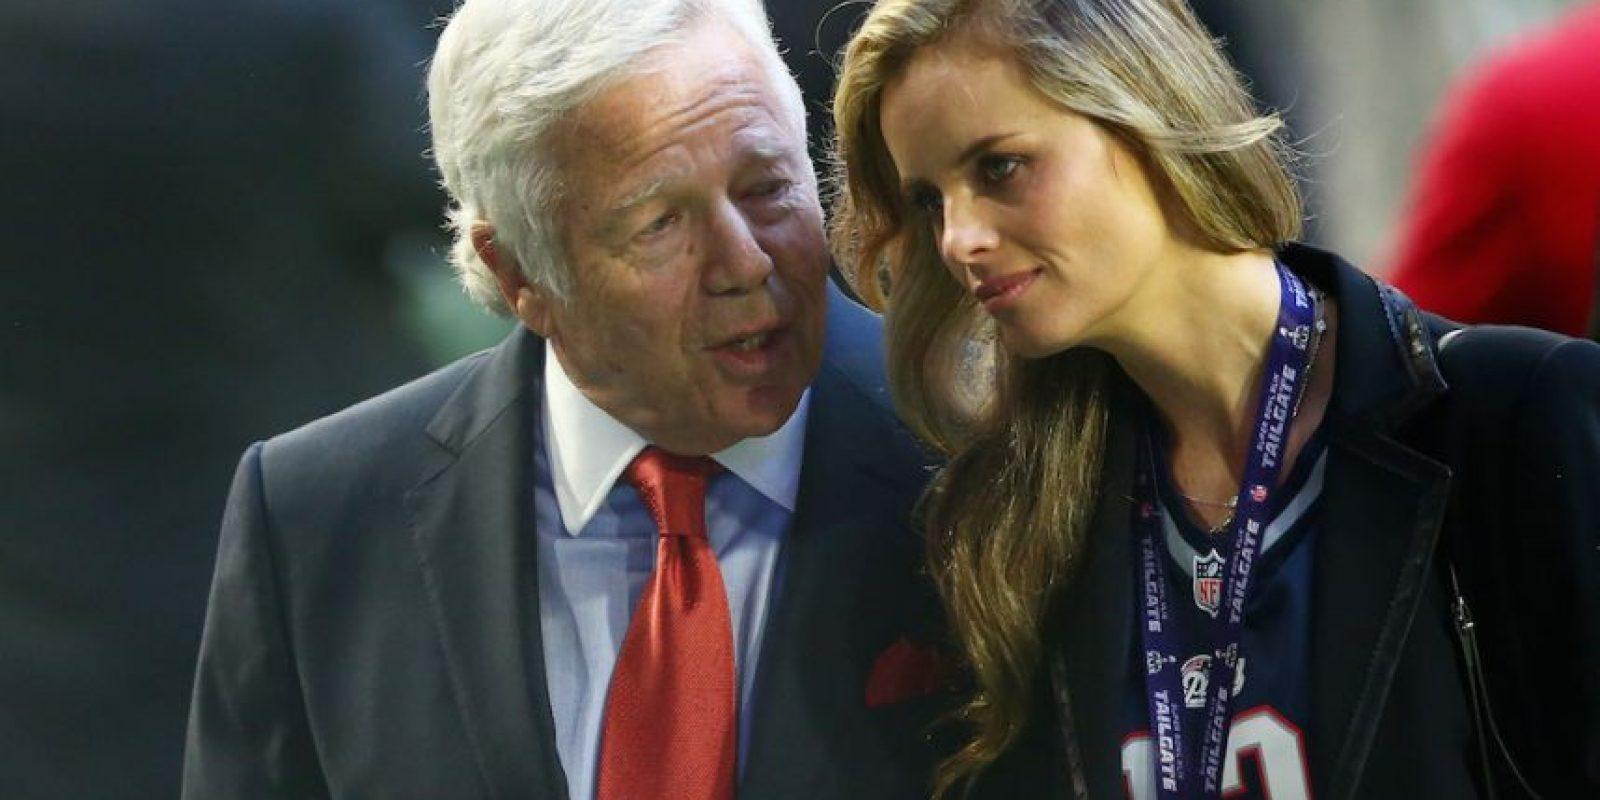 Gisele Bündchen junto al magnate Robert Kraft. Foto:Getty Images